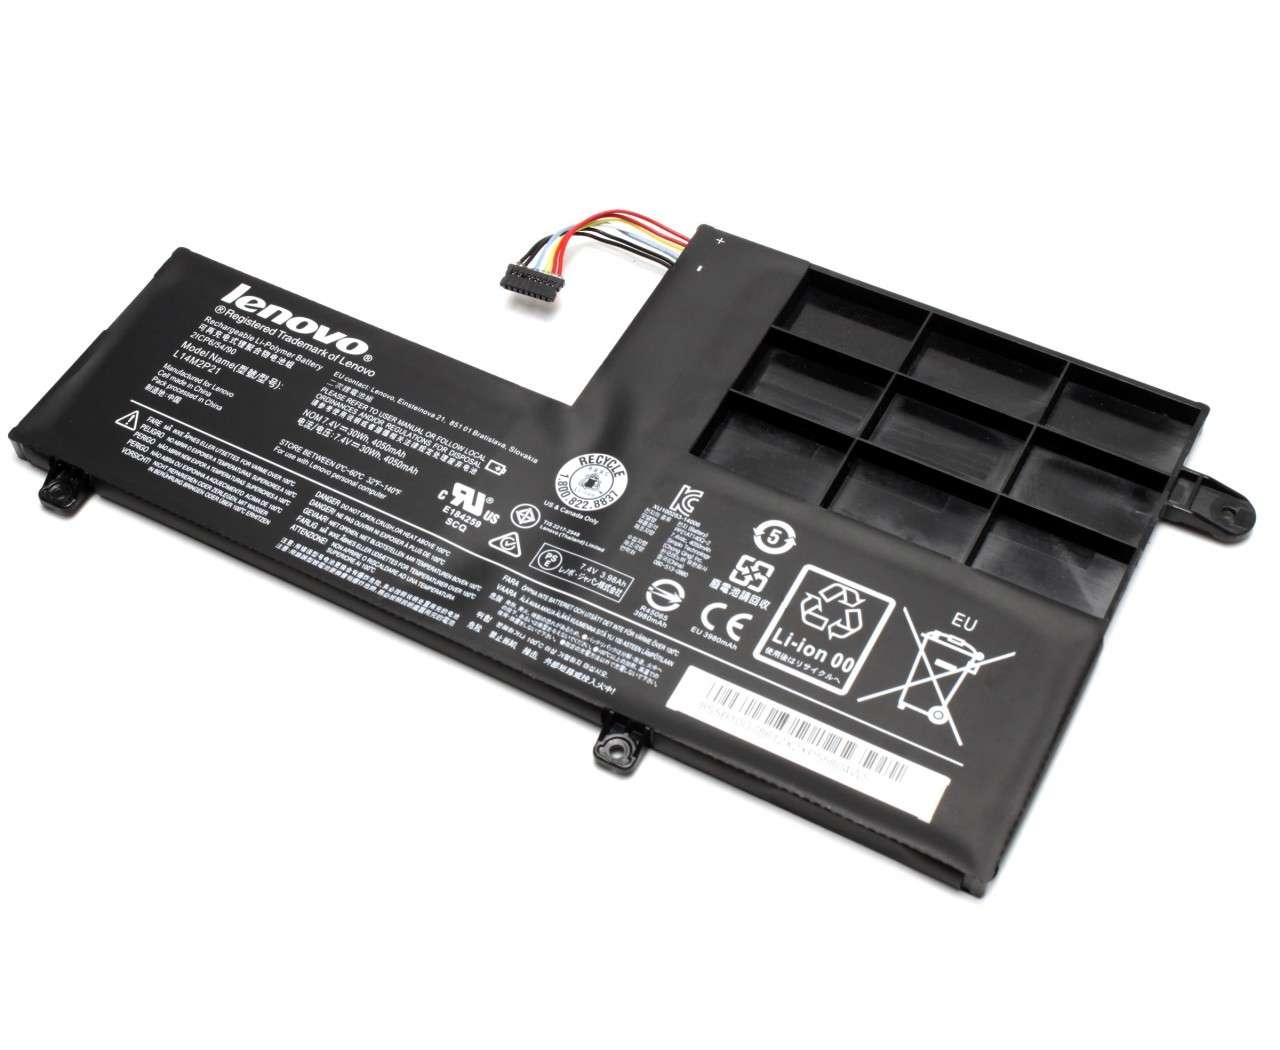 Baterie Lenovo IdeaPad 510S-14ISK Originala 30Wh/4050mAh 2 celule imagine powerlaptop.ro 2021